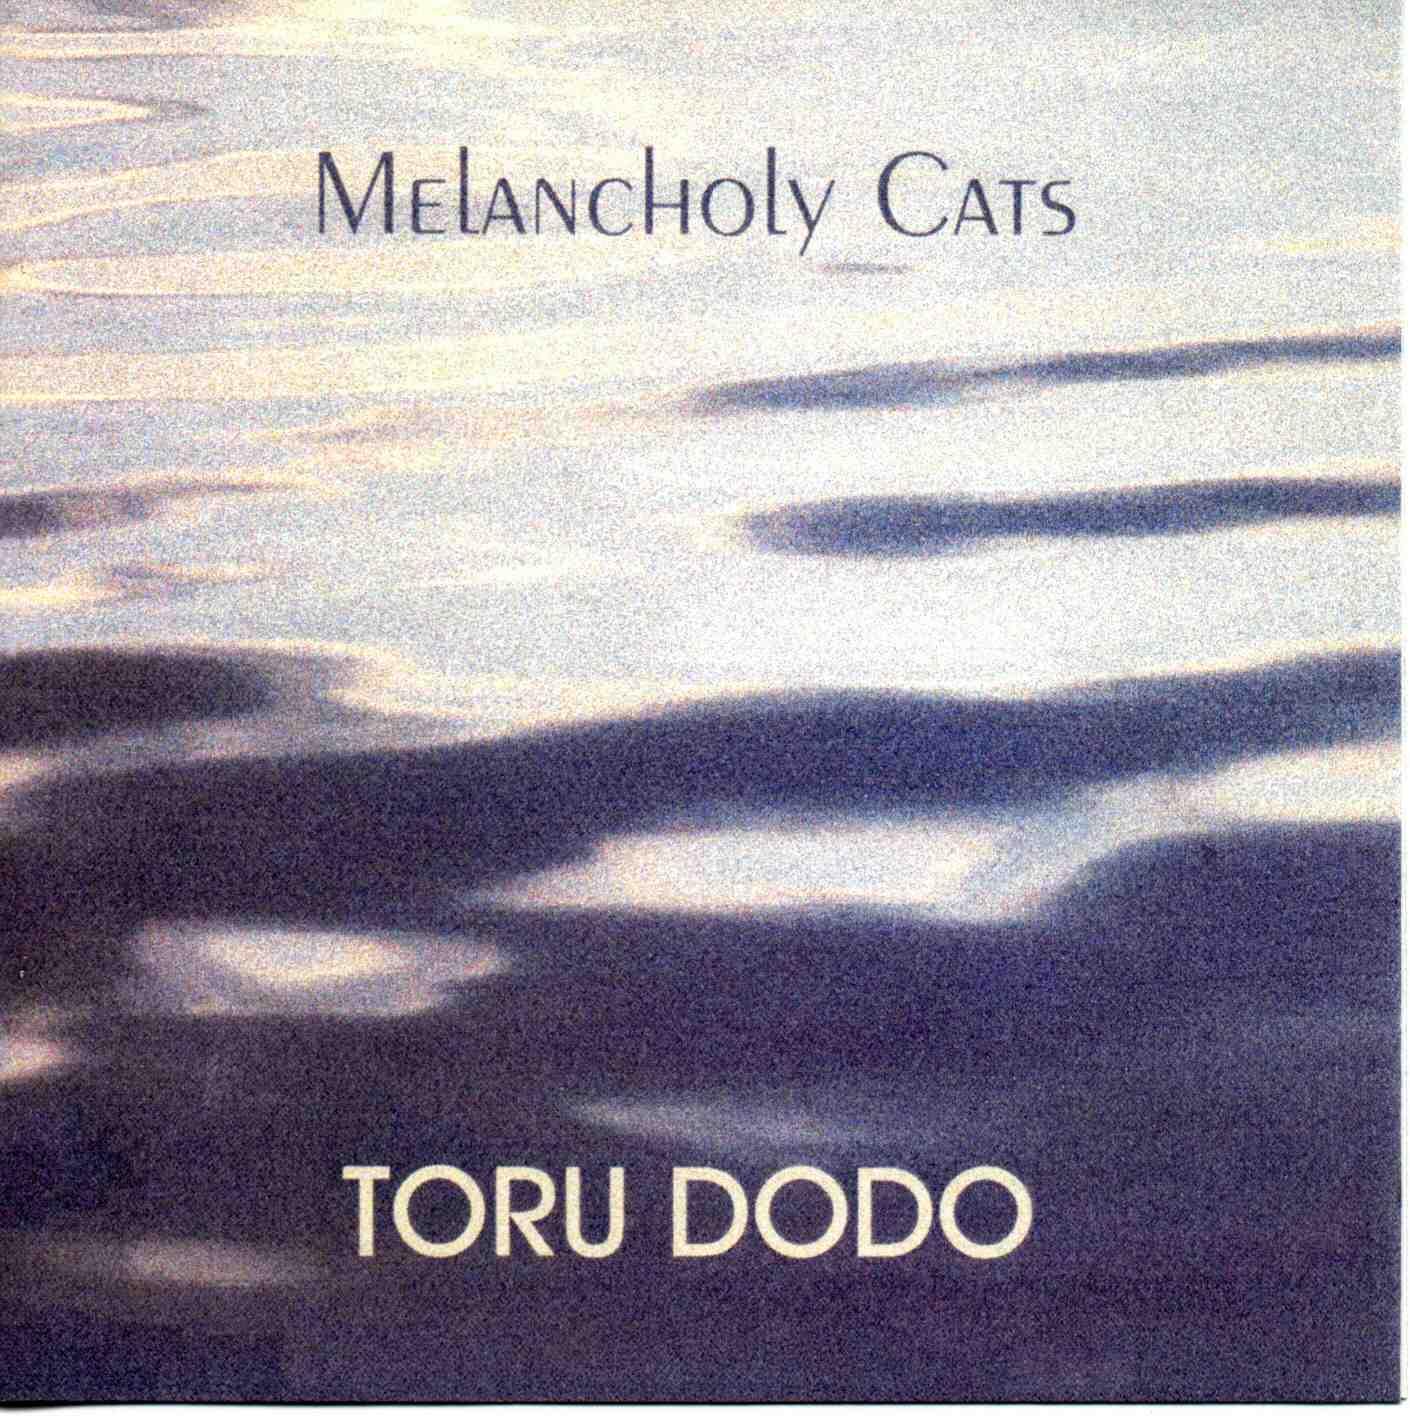 Melancholycats image